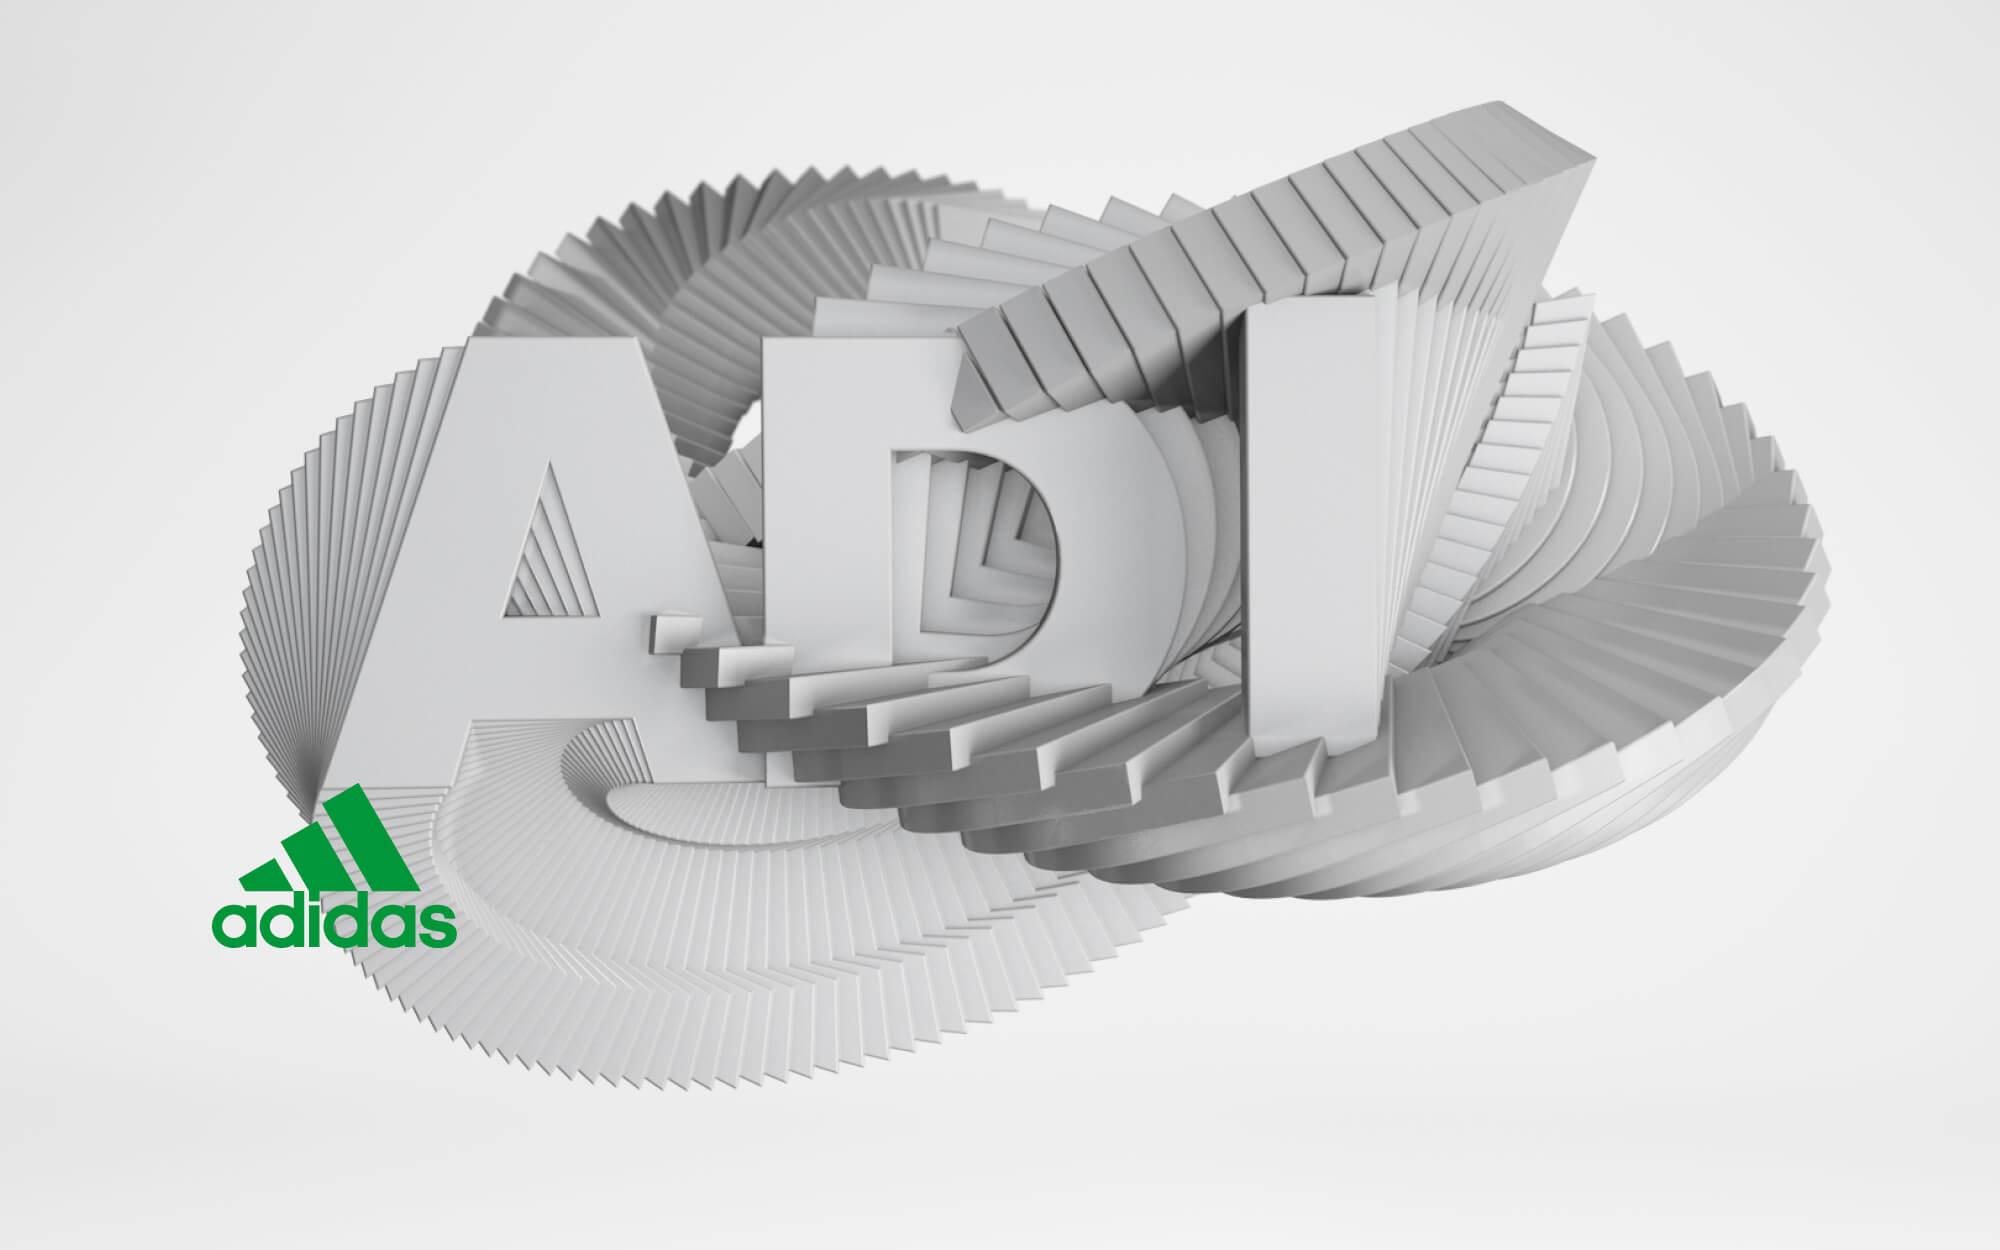 EIGA_adidas_TypeExploration_L_20